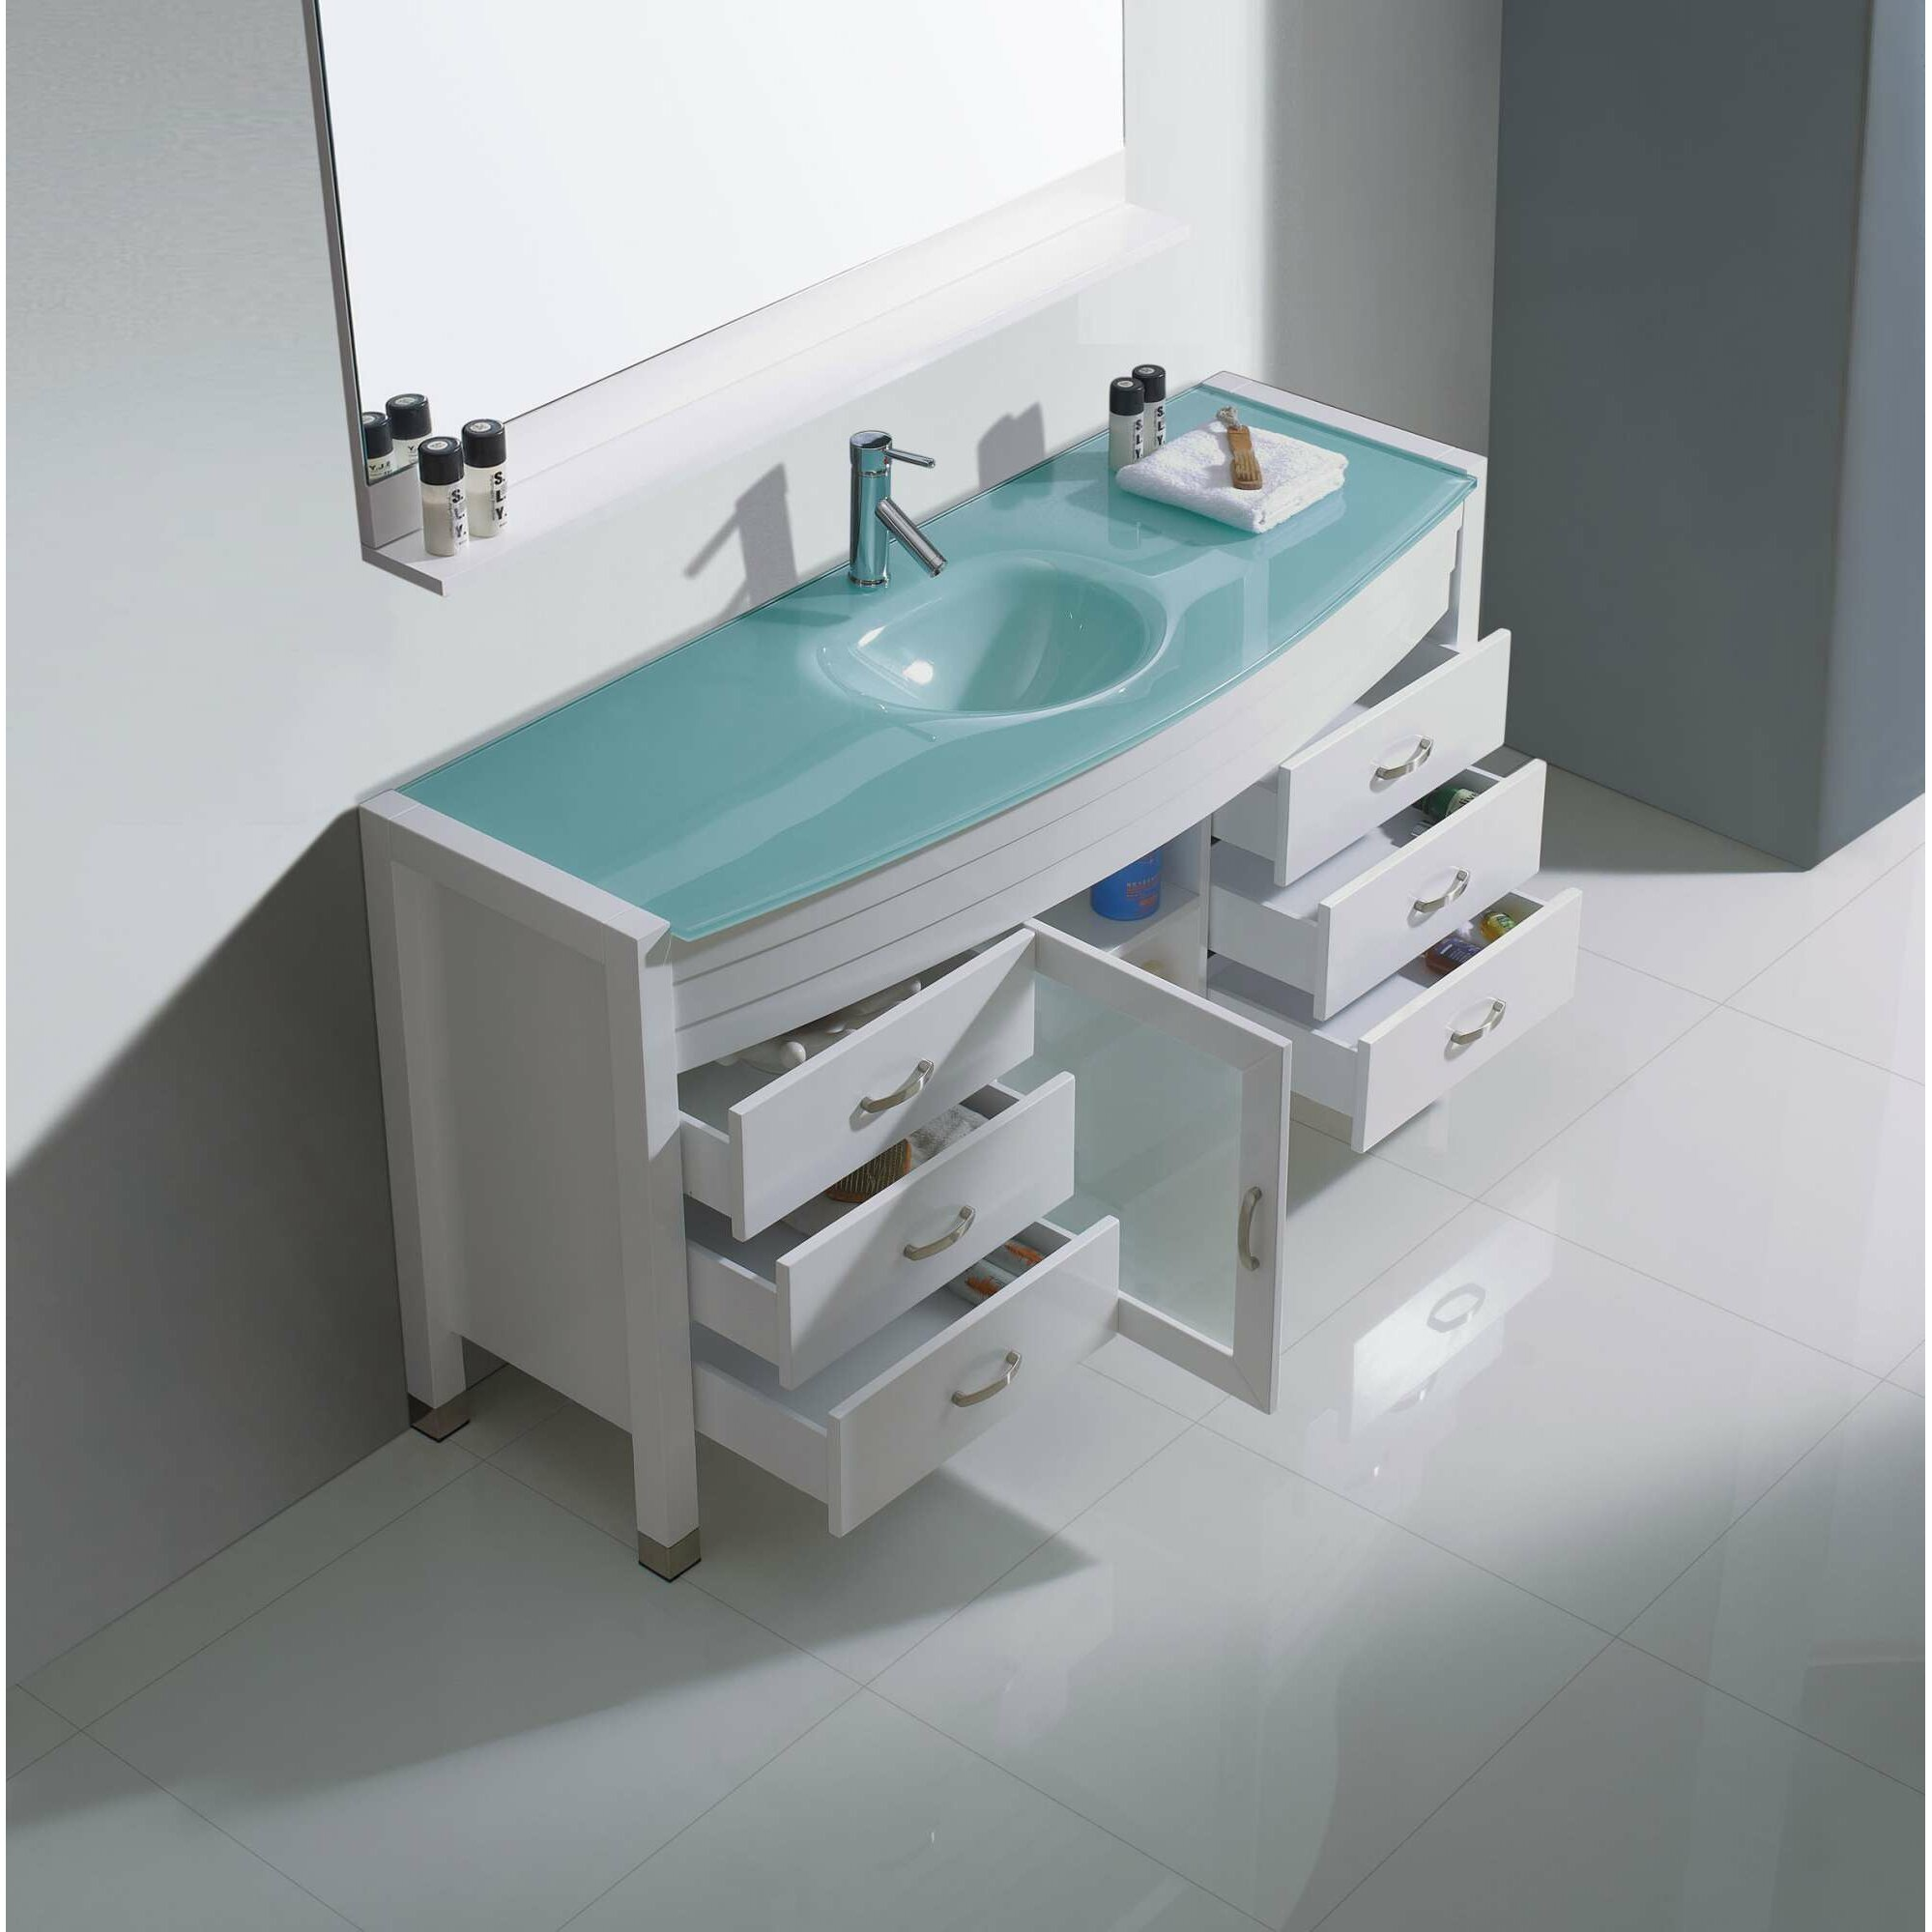 Lovely Bathroom Rentals Cost Tiny Light Blue Bathroom Sinks Solid Small Deep Bathtubs Bathtub Deep Cleaning Youthful Tall Bathroom Vanity Height DarkGlass Block Designs For Small Bathrooms 55 Bathroom Vanity